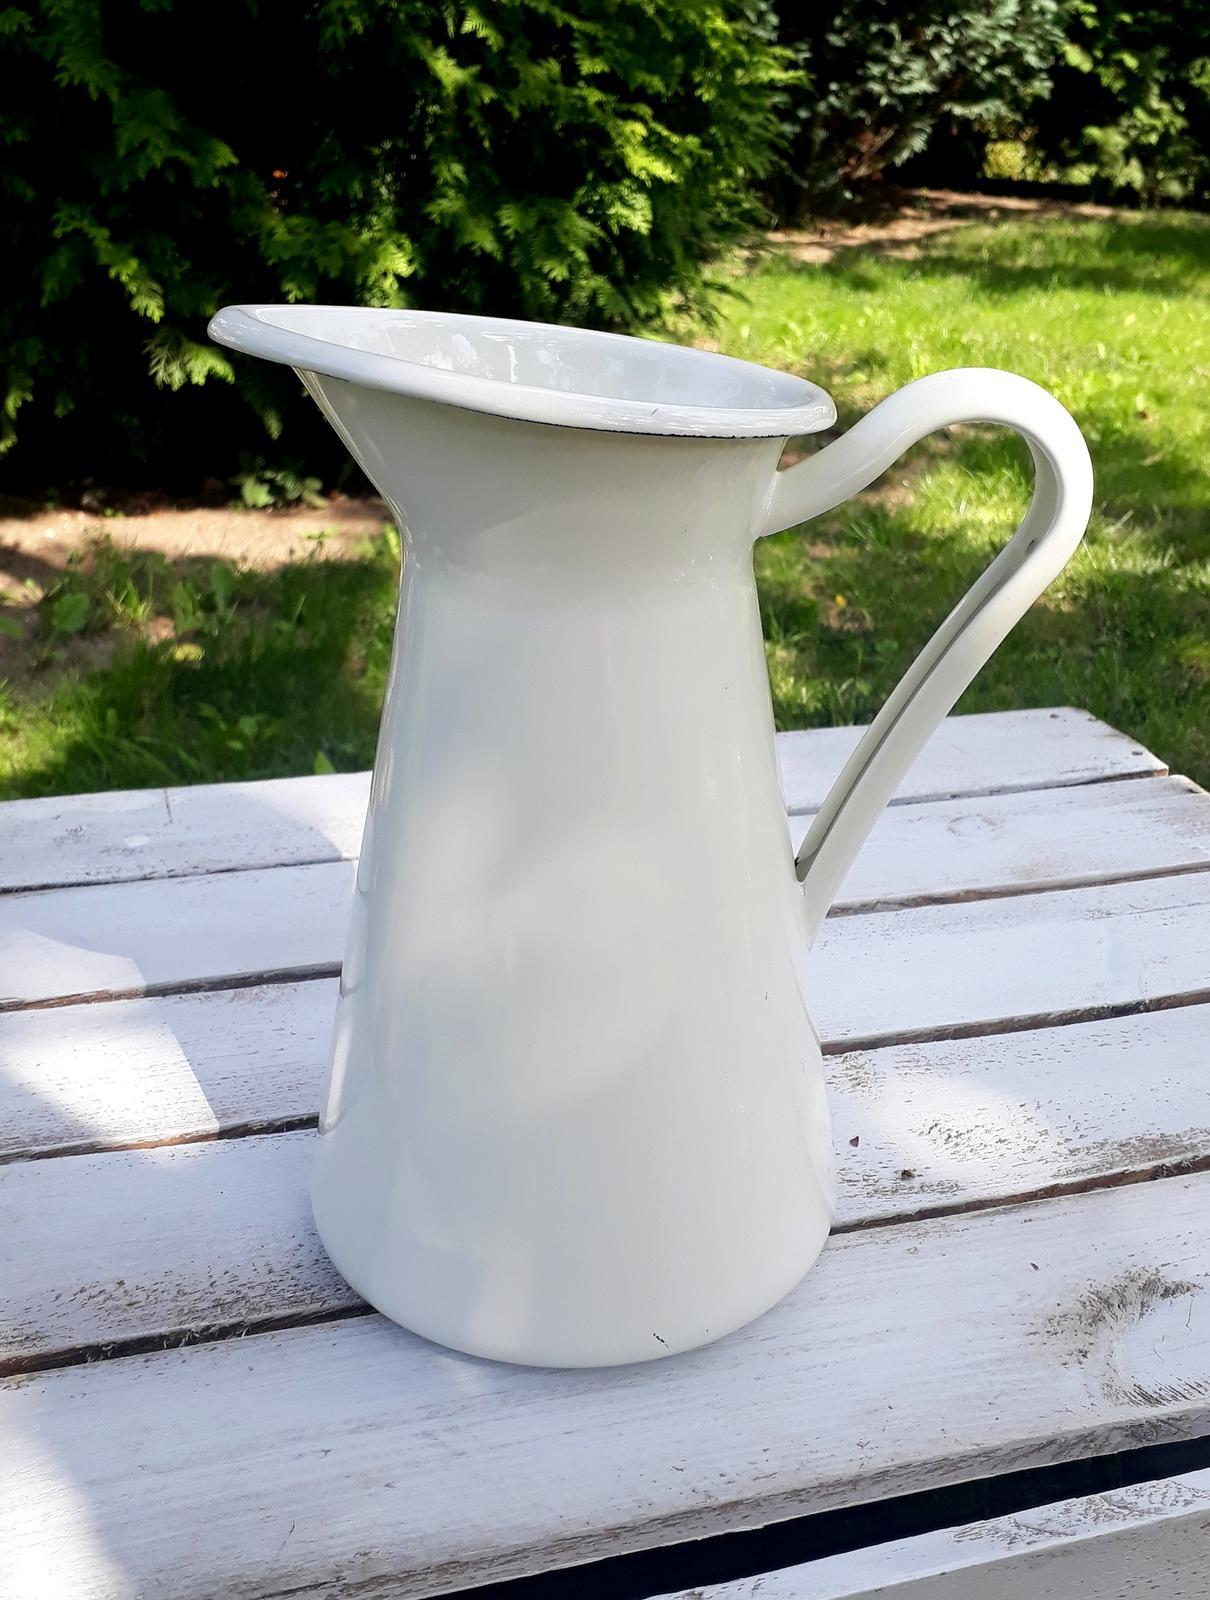 Váza/džbán - rezervováno - Obrázek č. 1